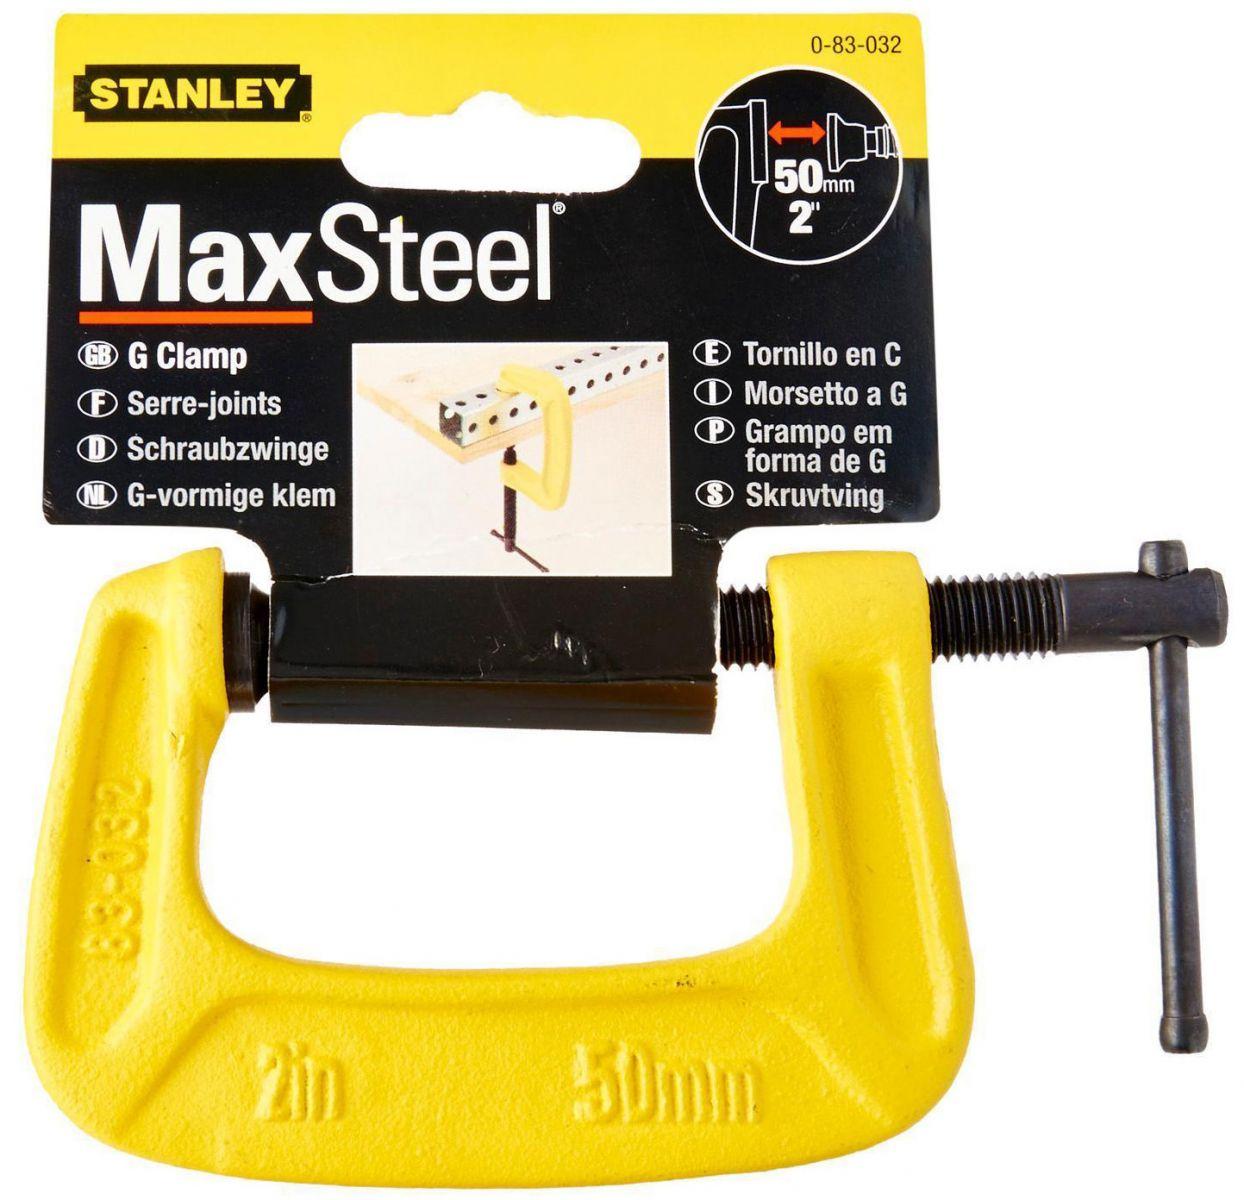 "Kẹp kiểu chữ C 3"" Stanley 83-033K"